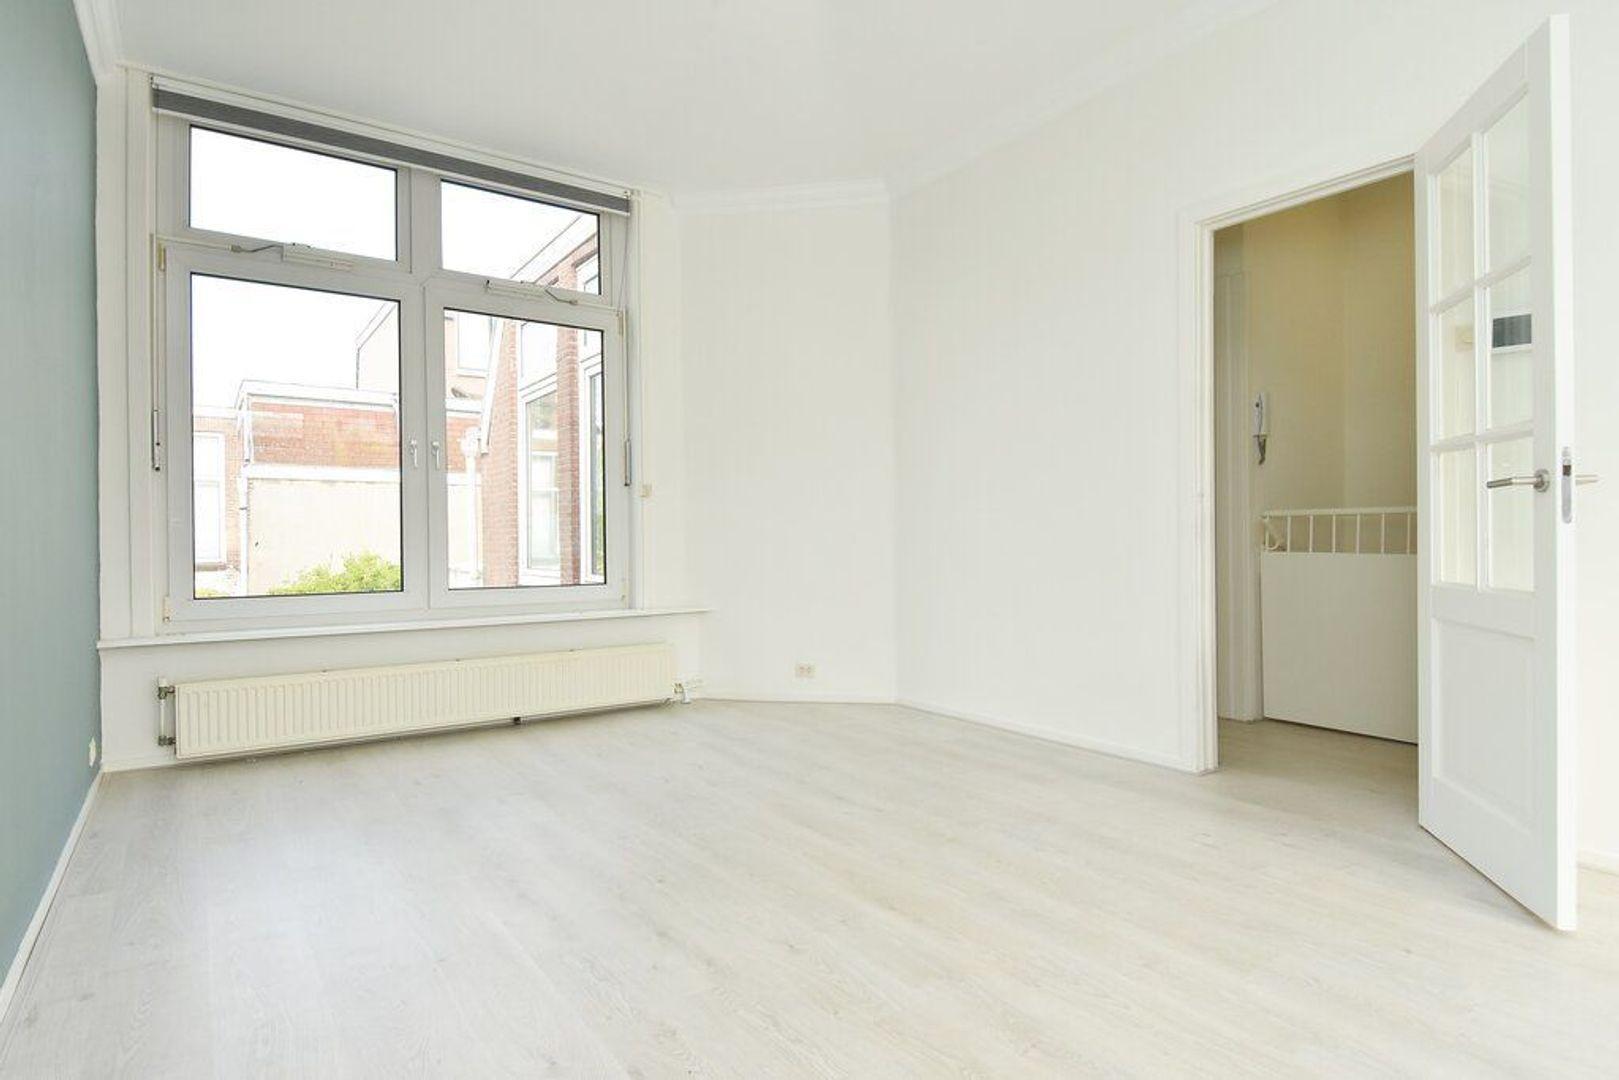 Kenaustraat 12, Den Haag foto-9 blur